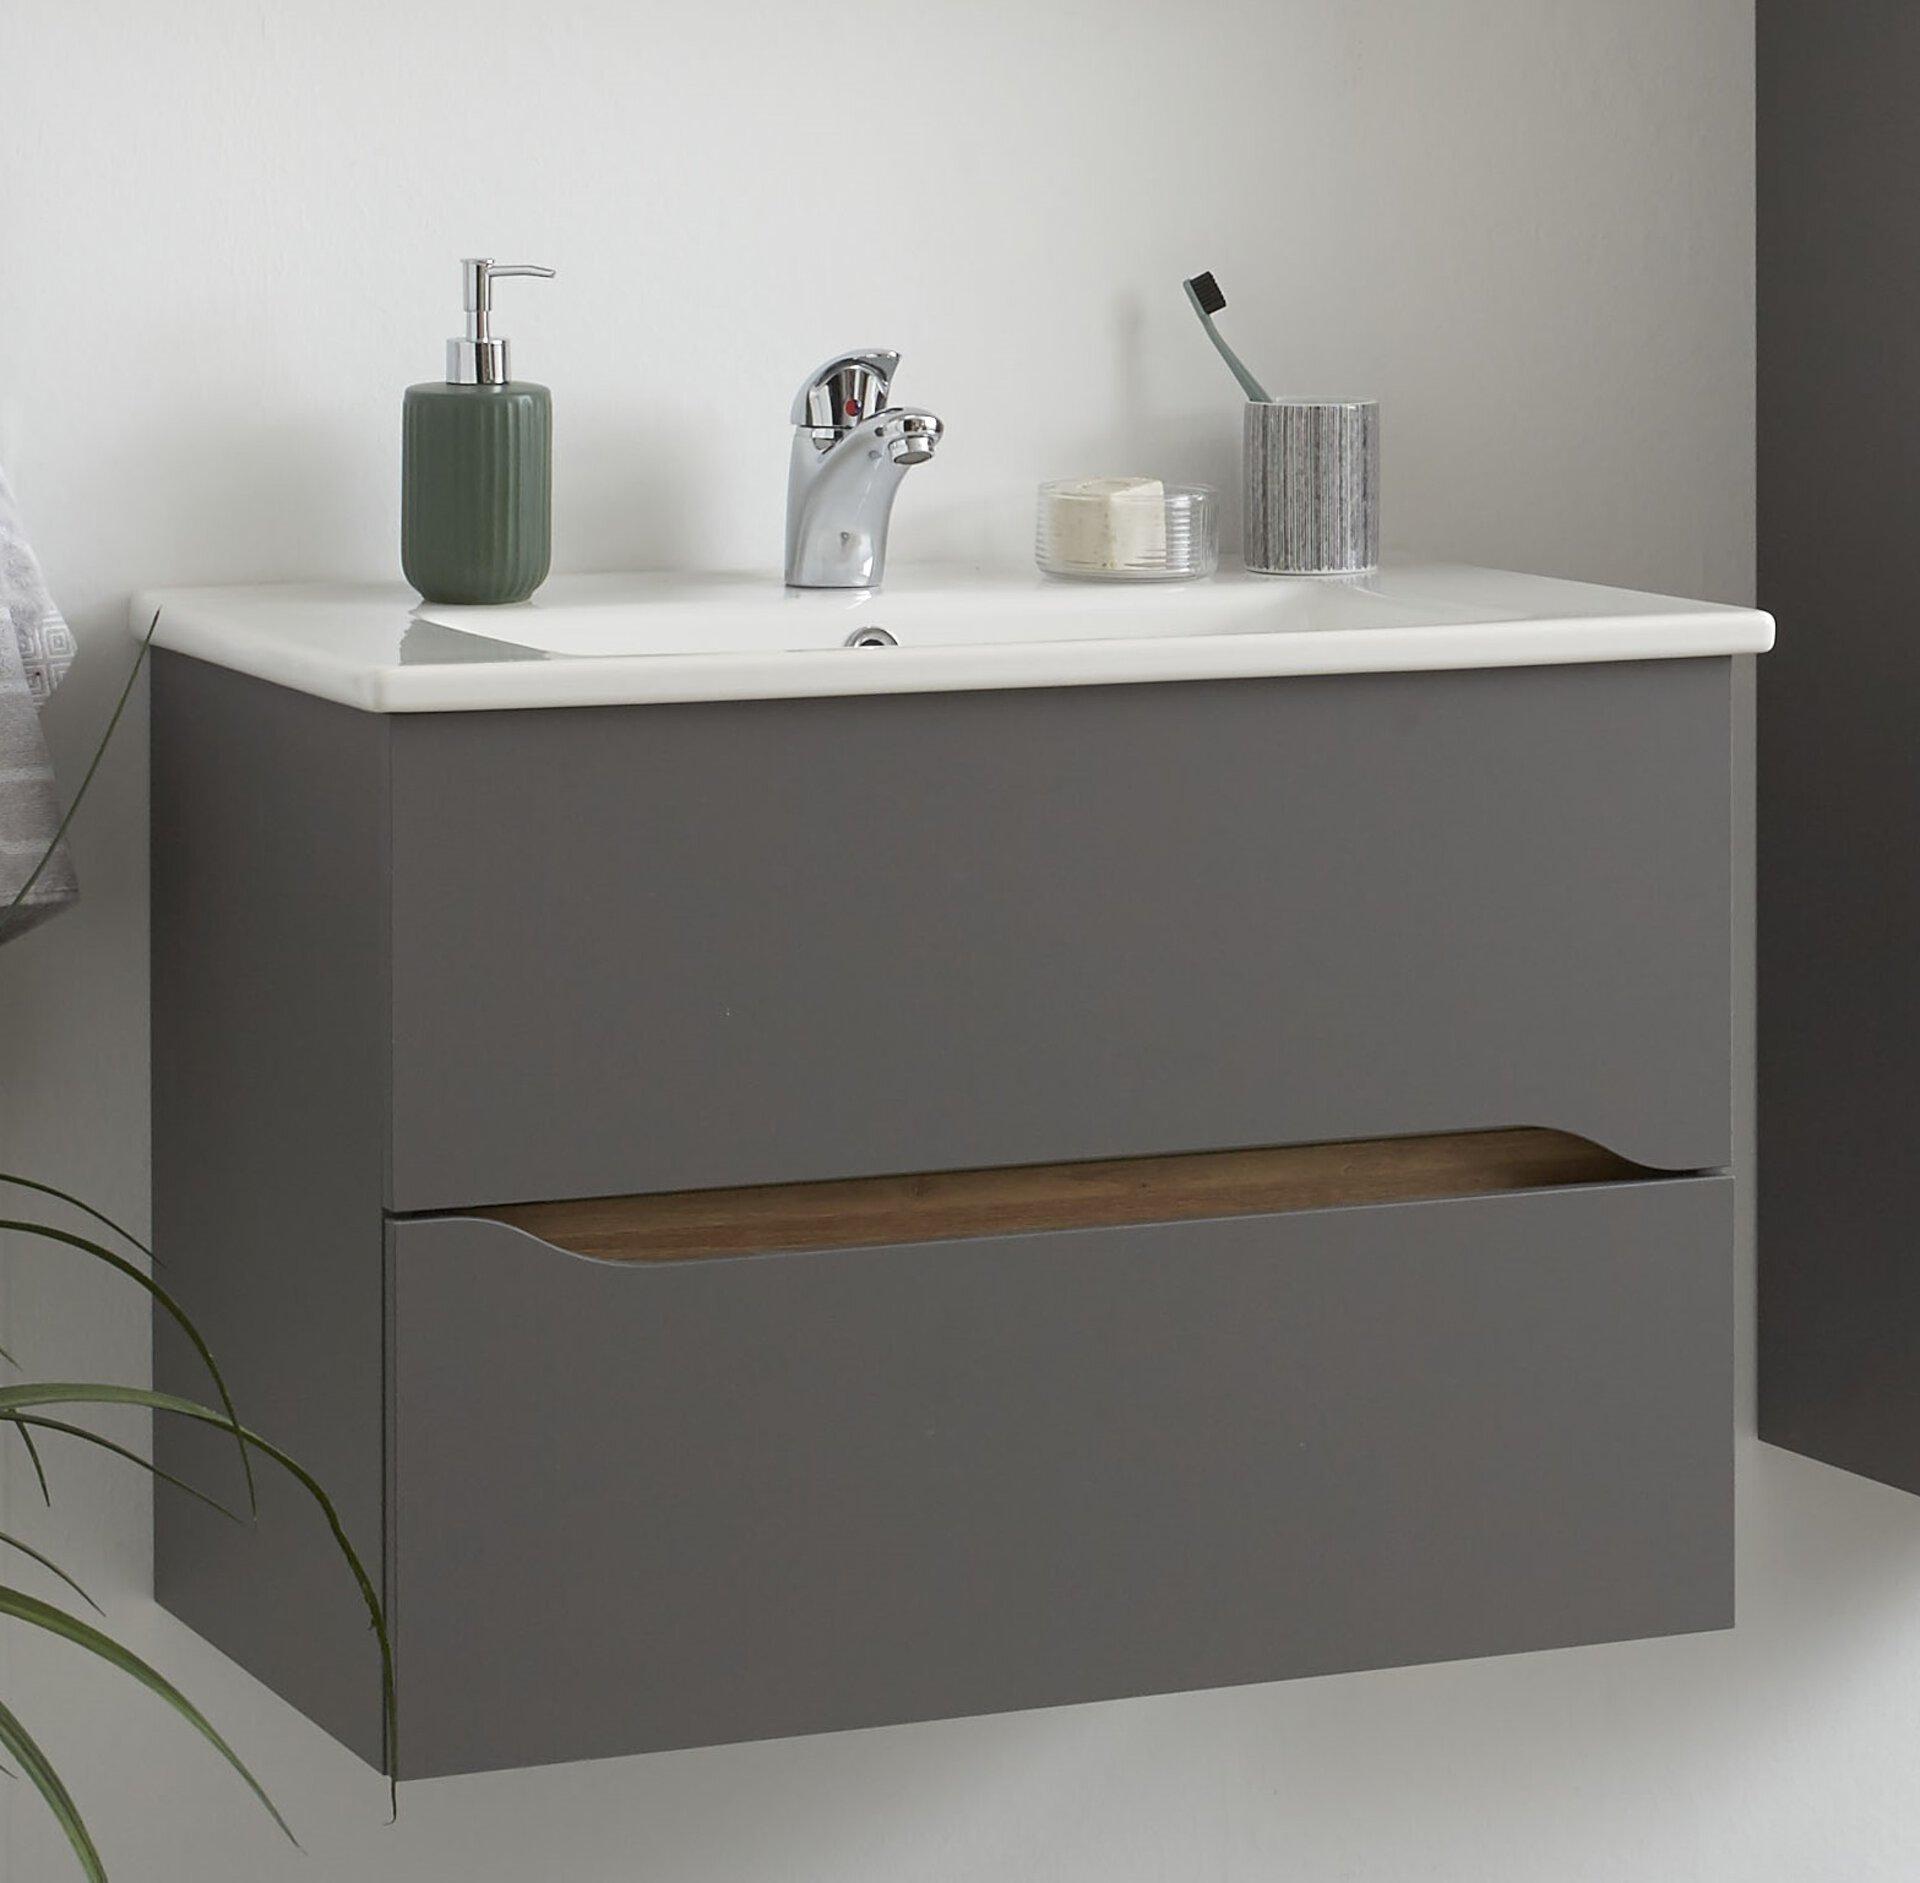 Waschtischunterschrank Capri PELIPAL Holzwerkstoff grau